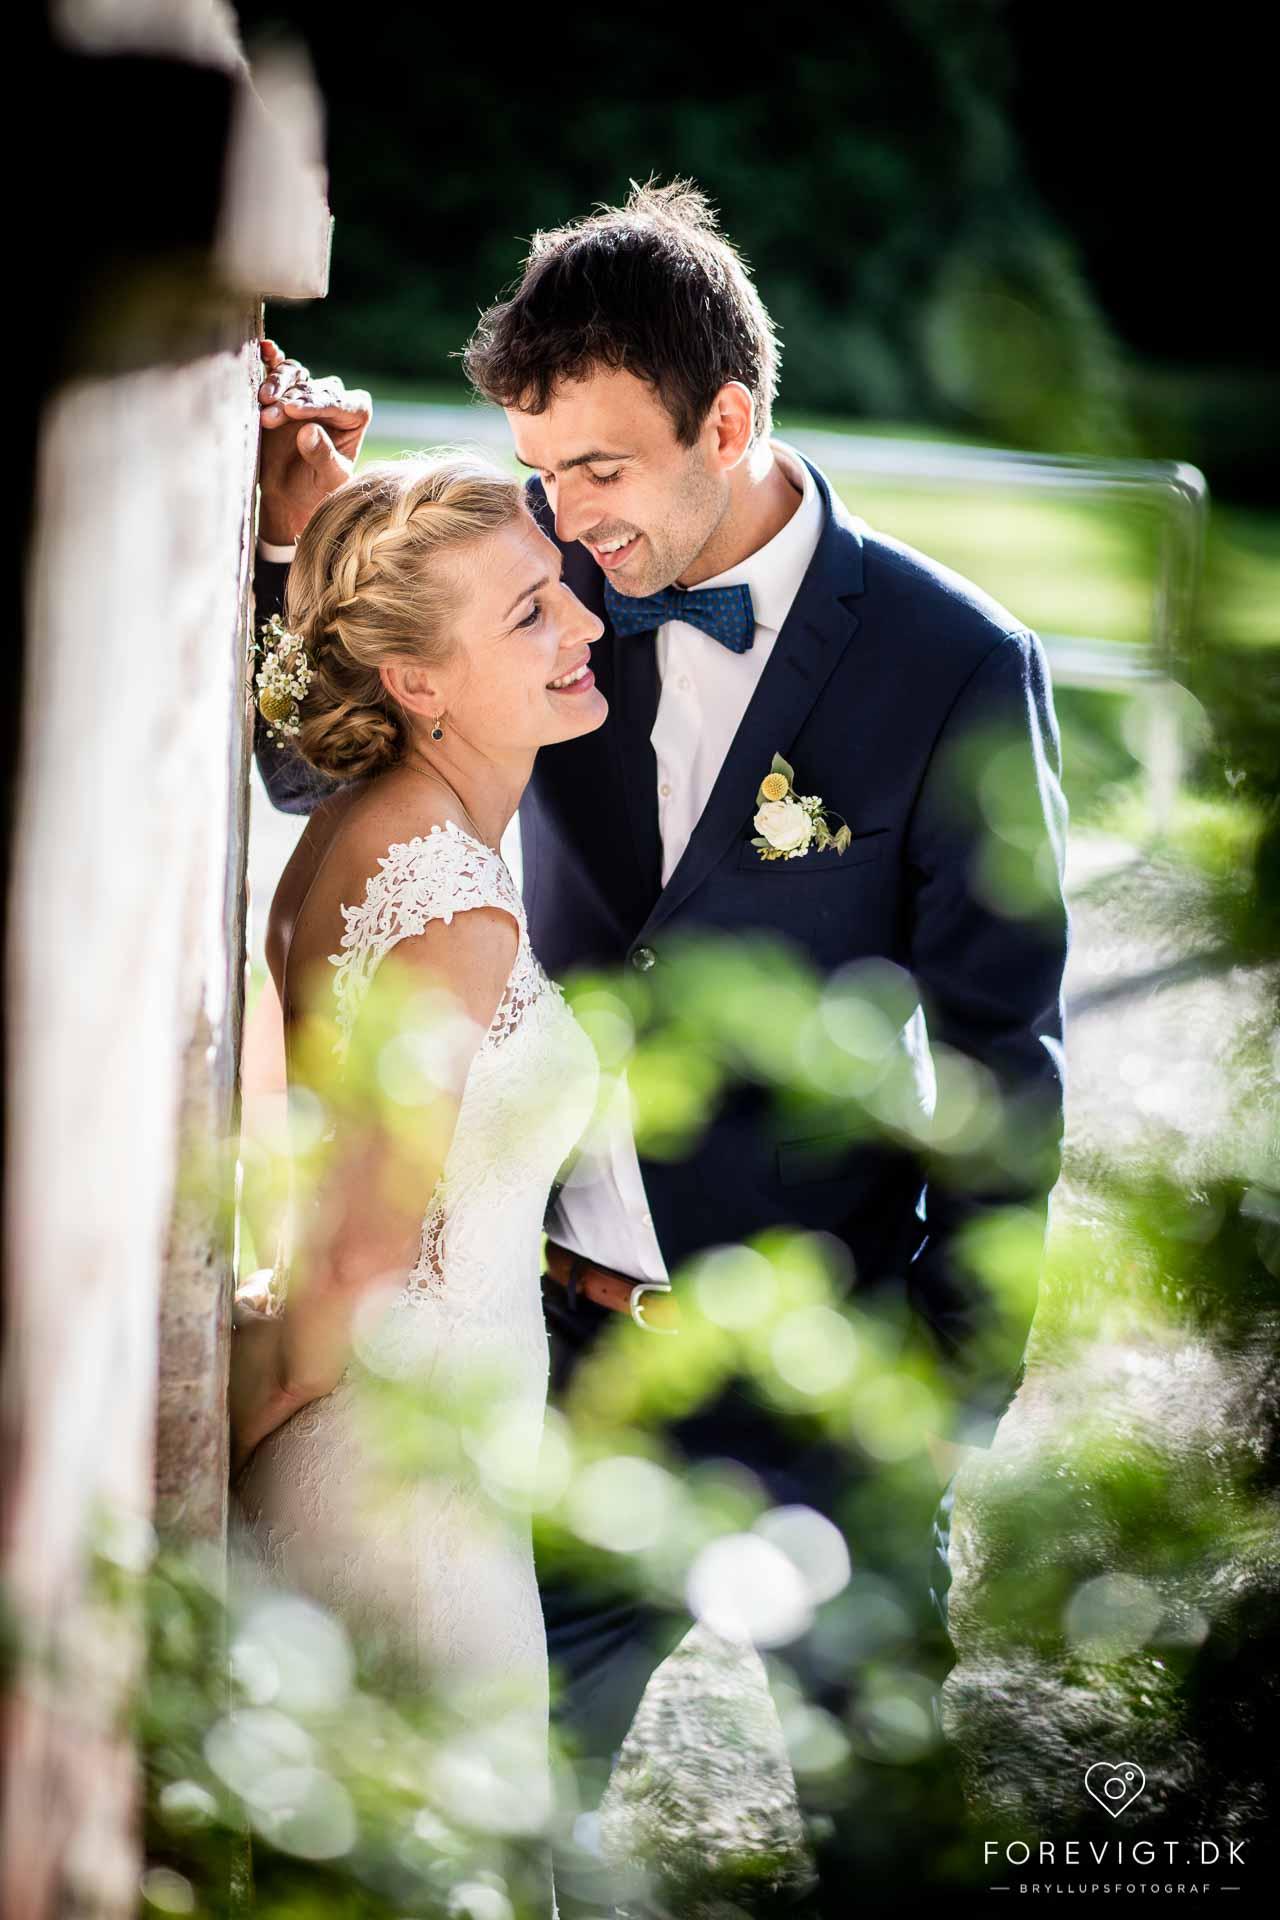 Billig bryllupsfotograf Roskilde